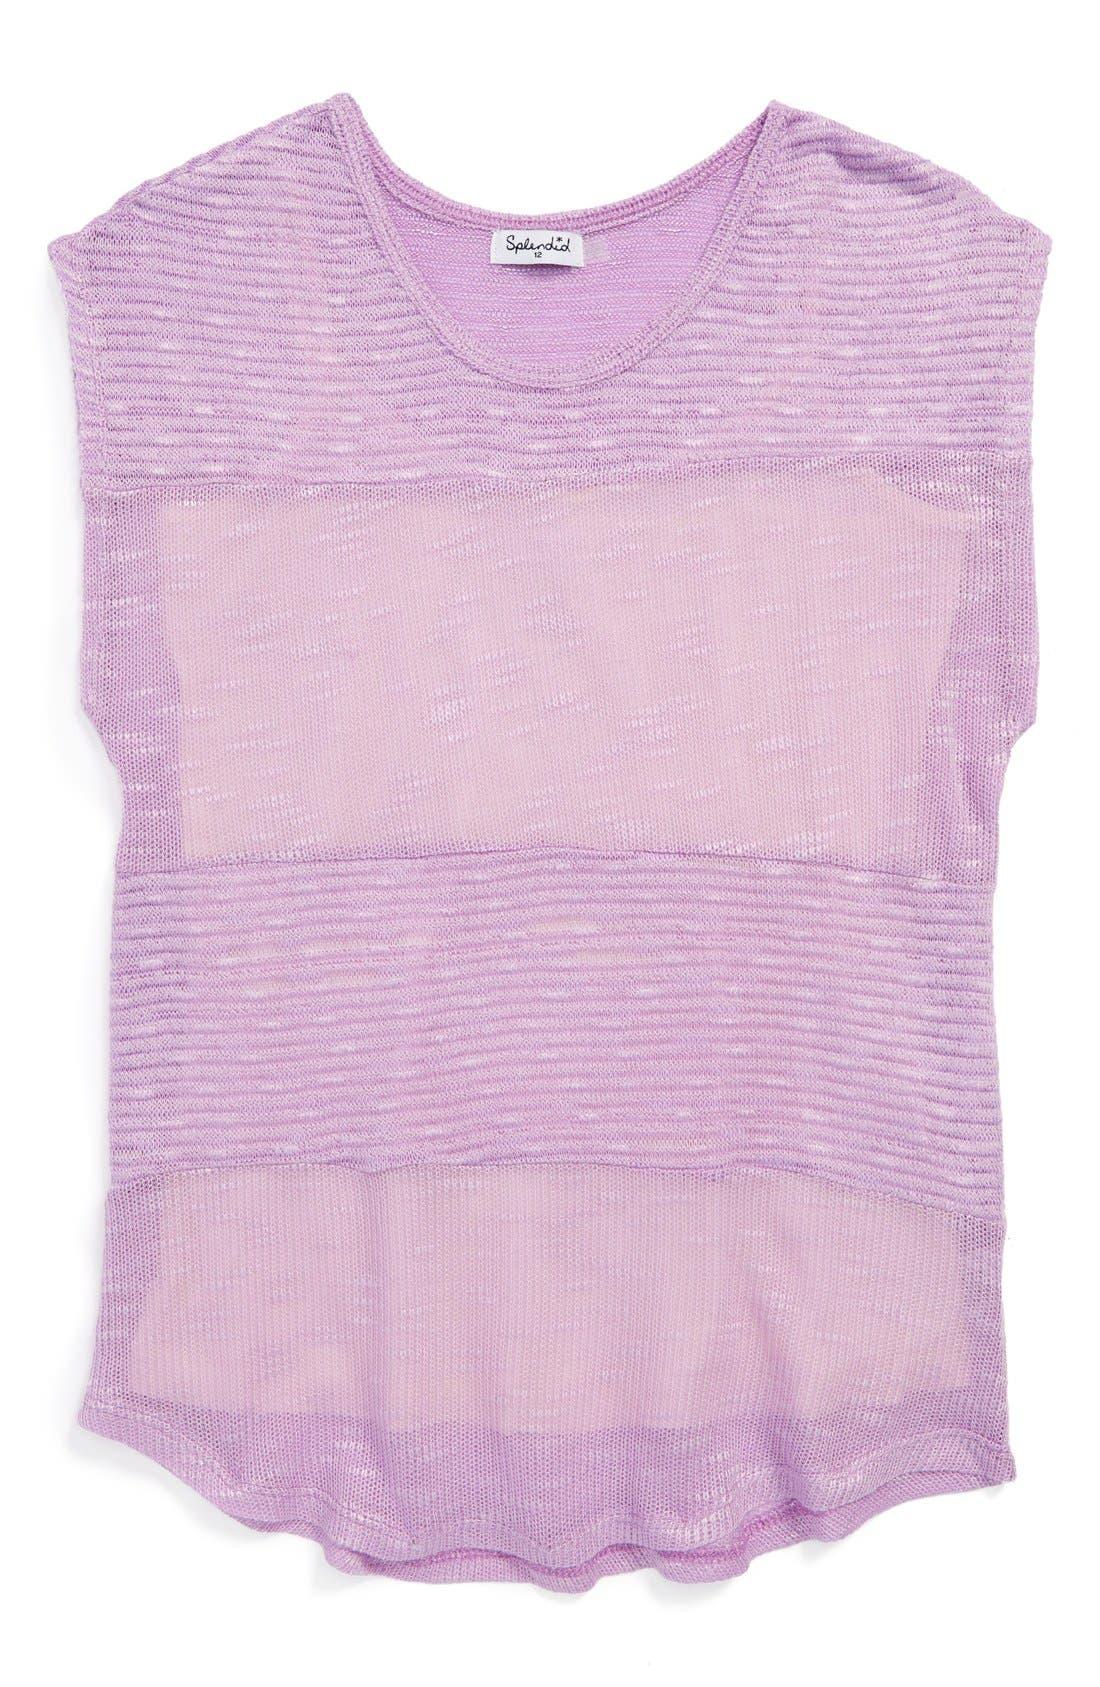 Main Image - Splendid Loose Knit Top (Big Girls)